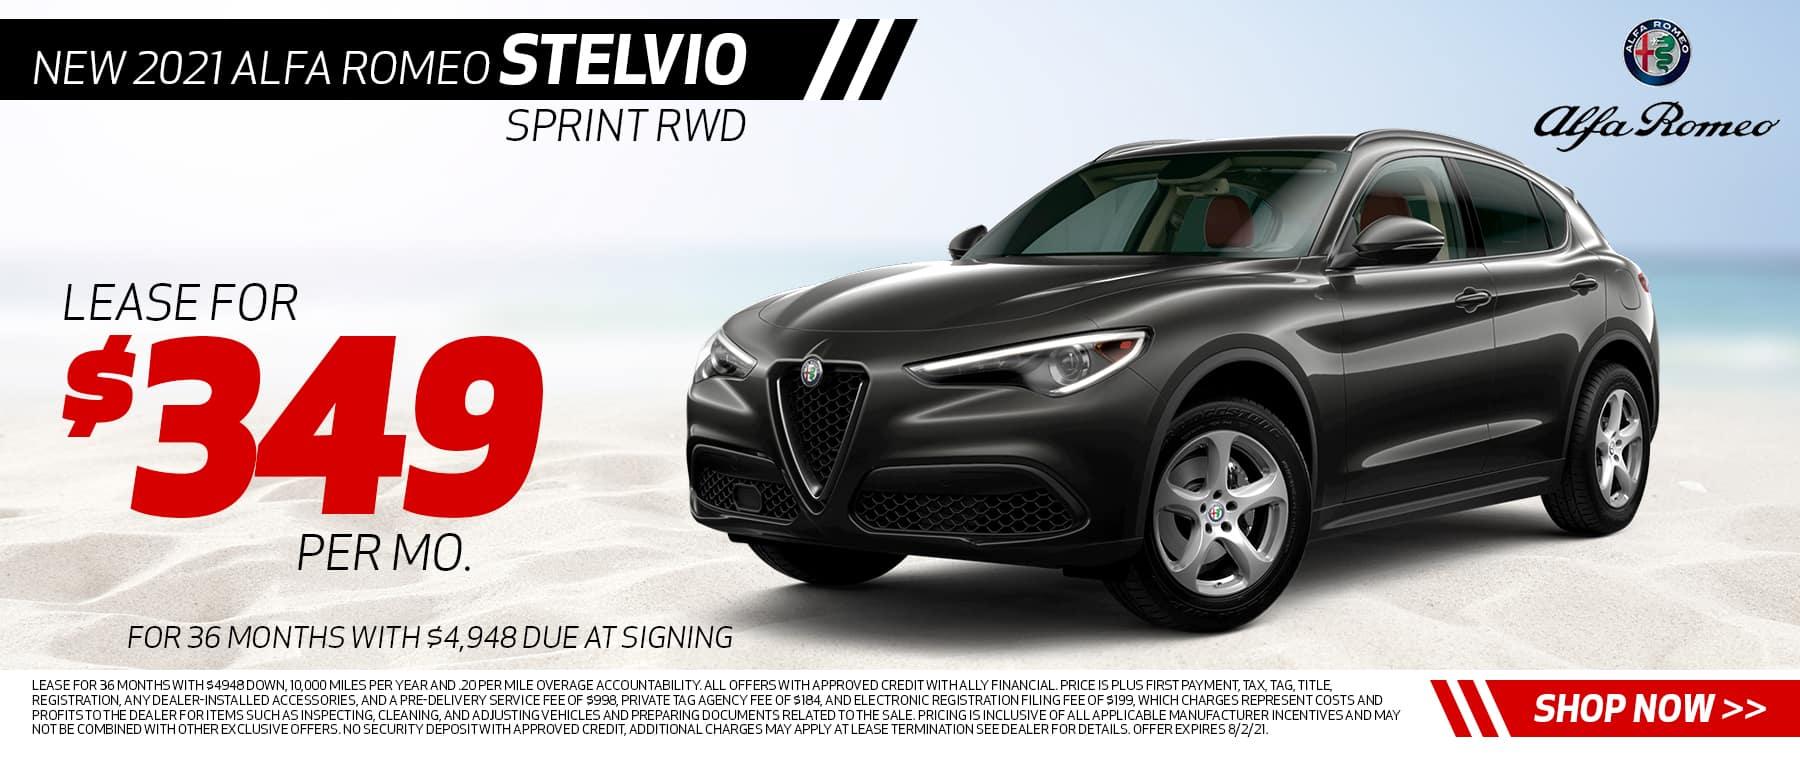 New 2021 Alfa Romeo Stelvio Sprint RWD